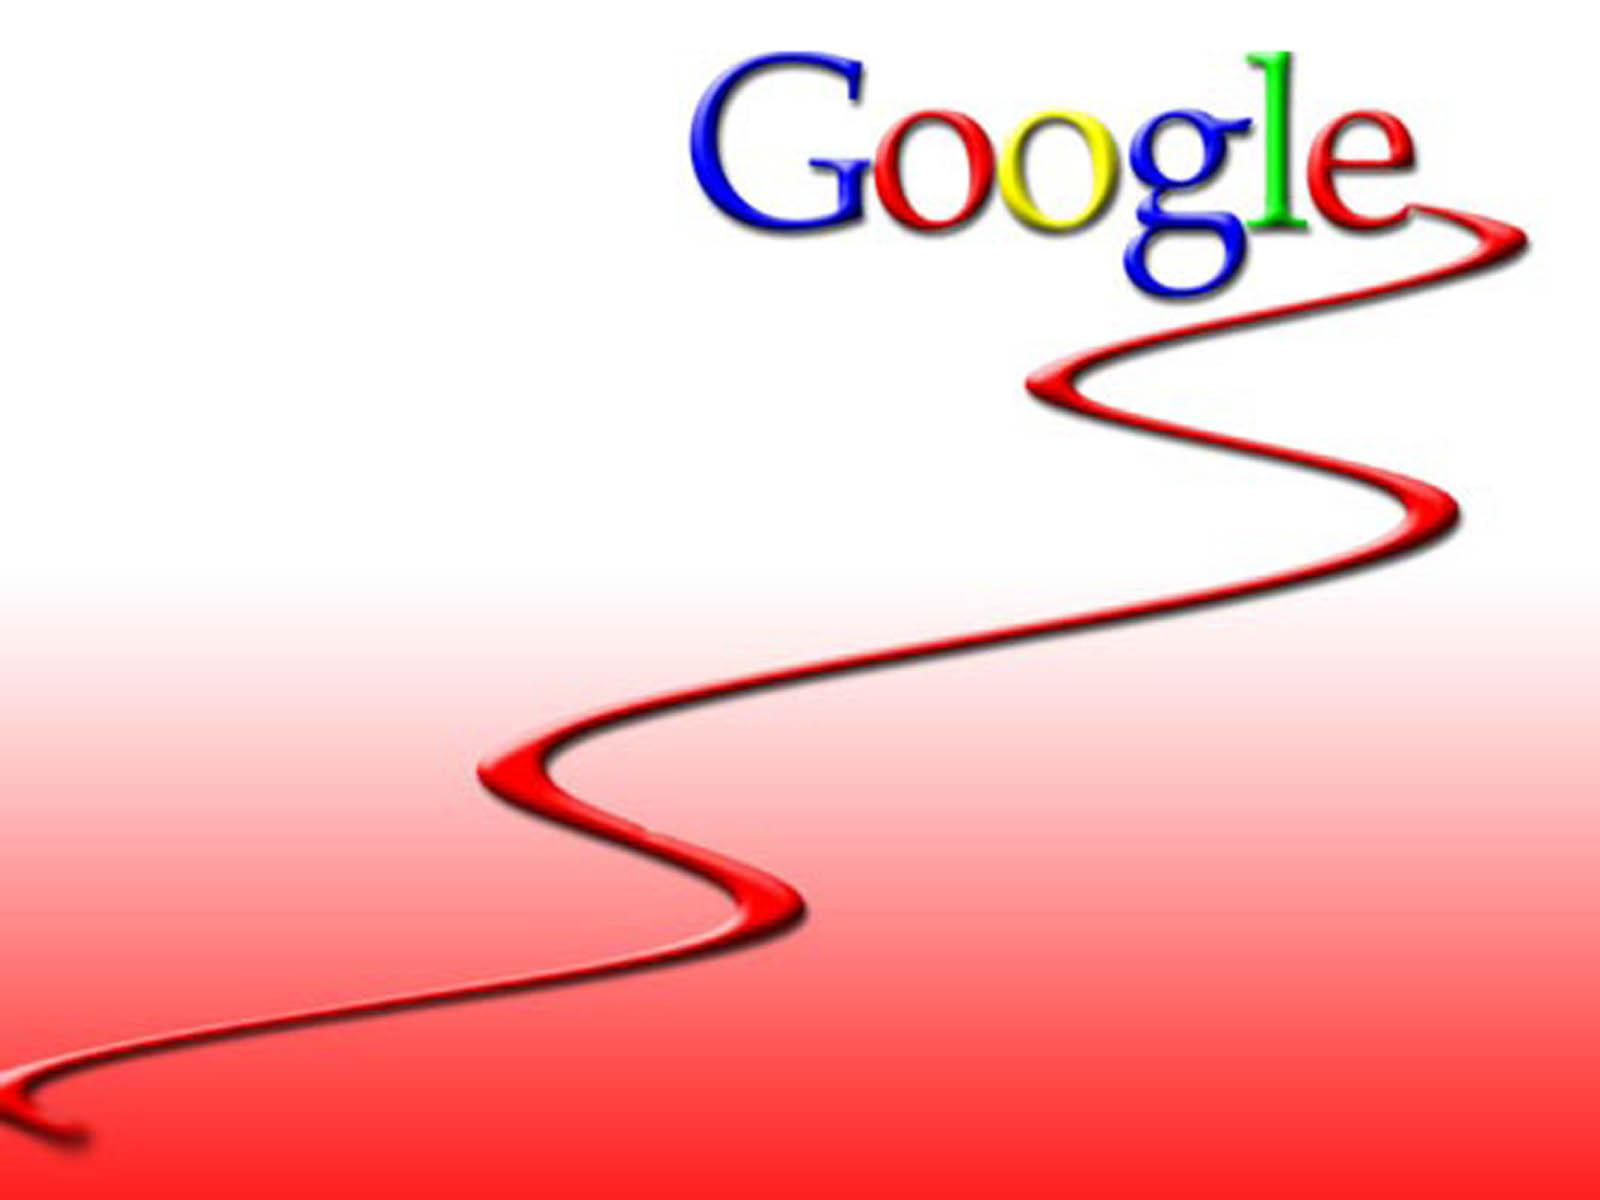 wallpaper: Google Desktop Backgrounds And Wallpapers